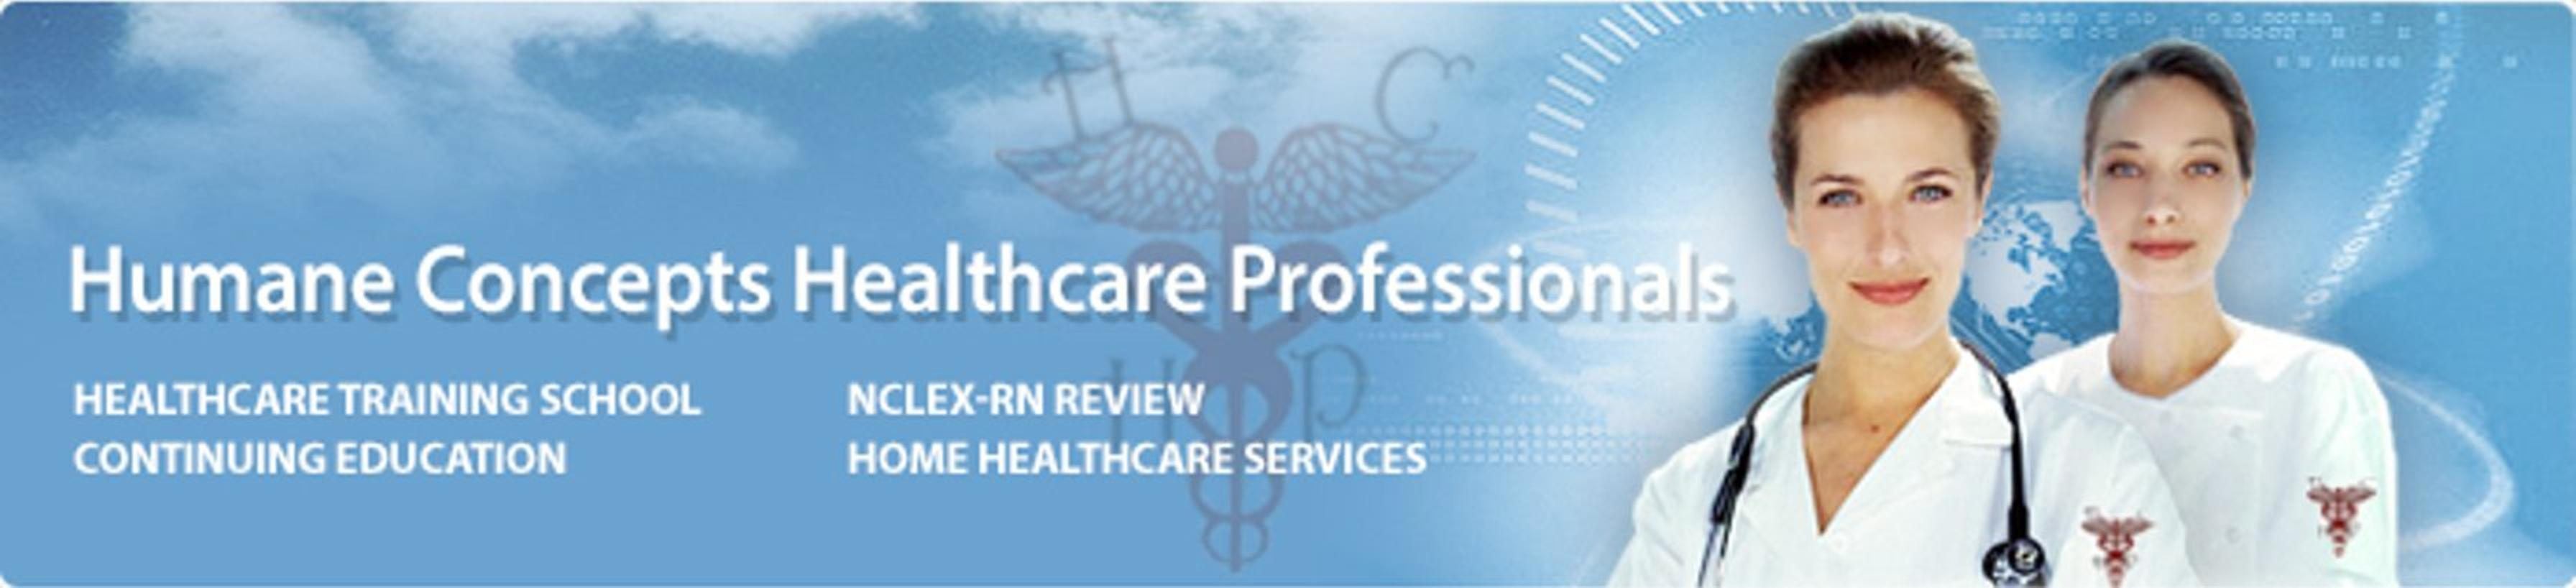 Humane Concepts HealthCare Professionals